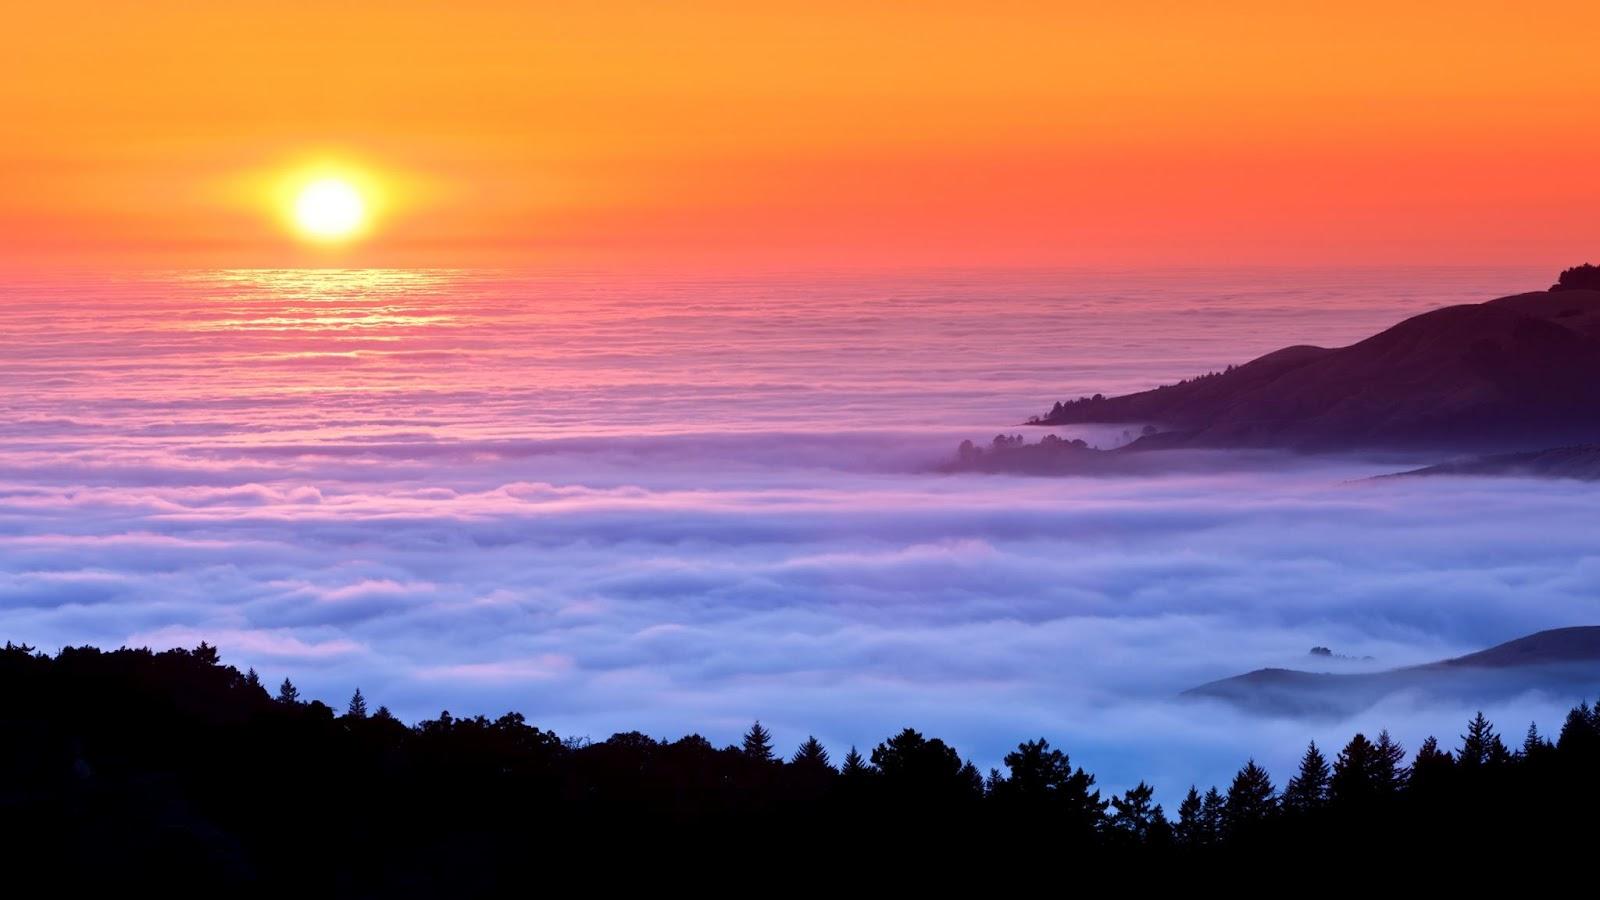 sunset awesome oregon wallpaper - photo #6